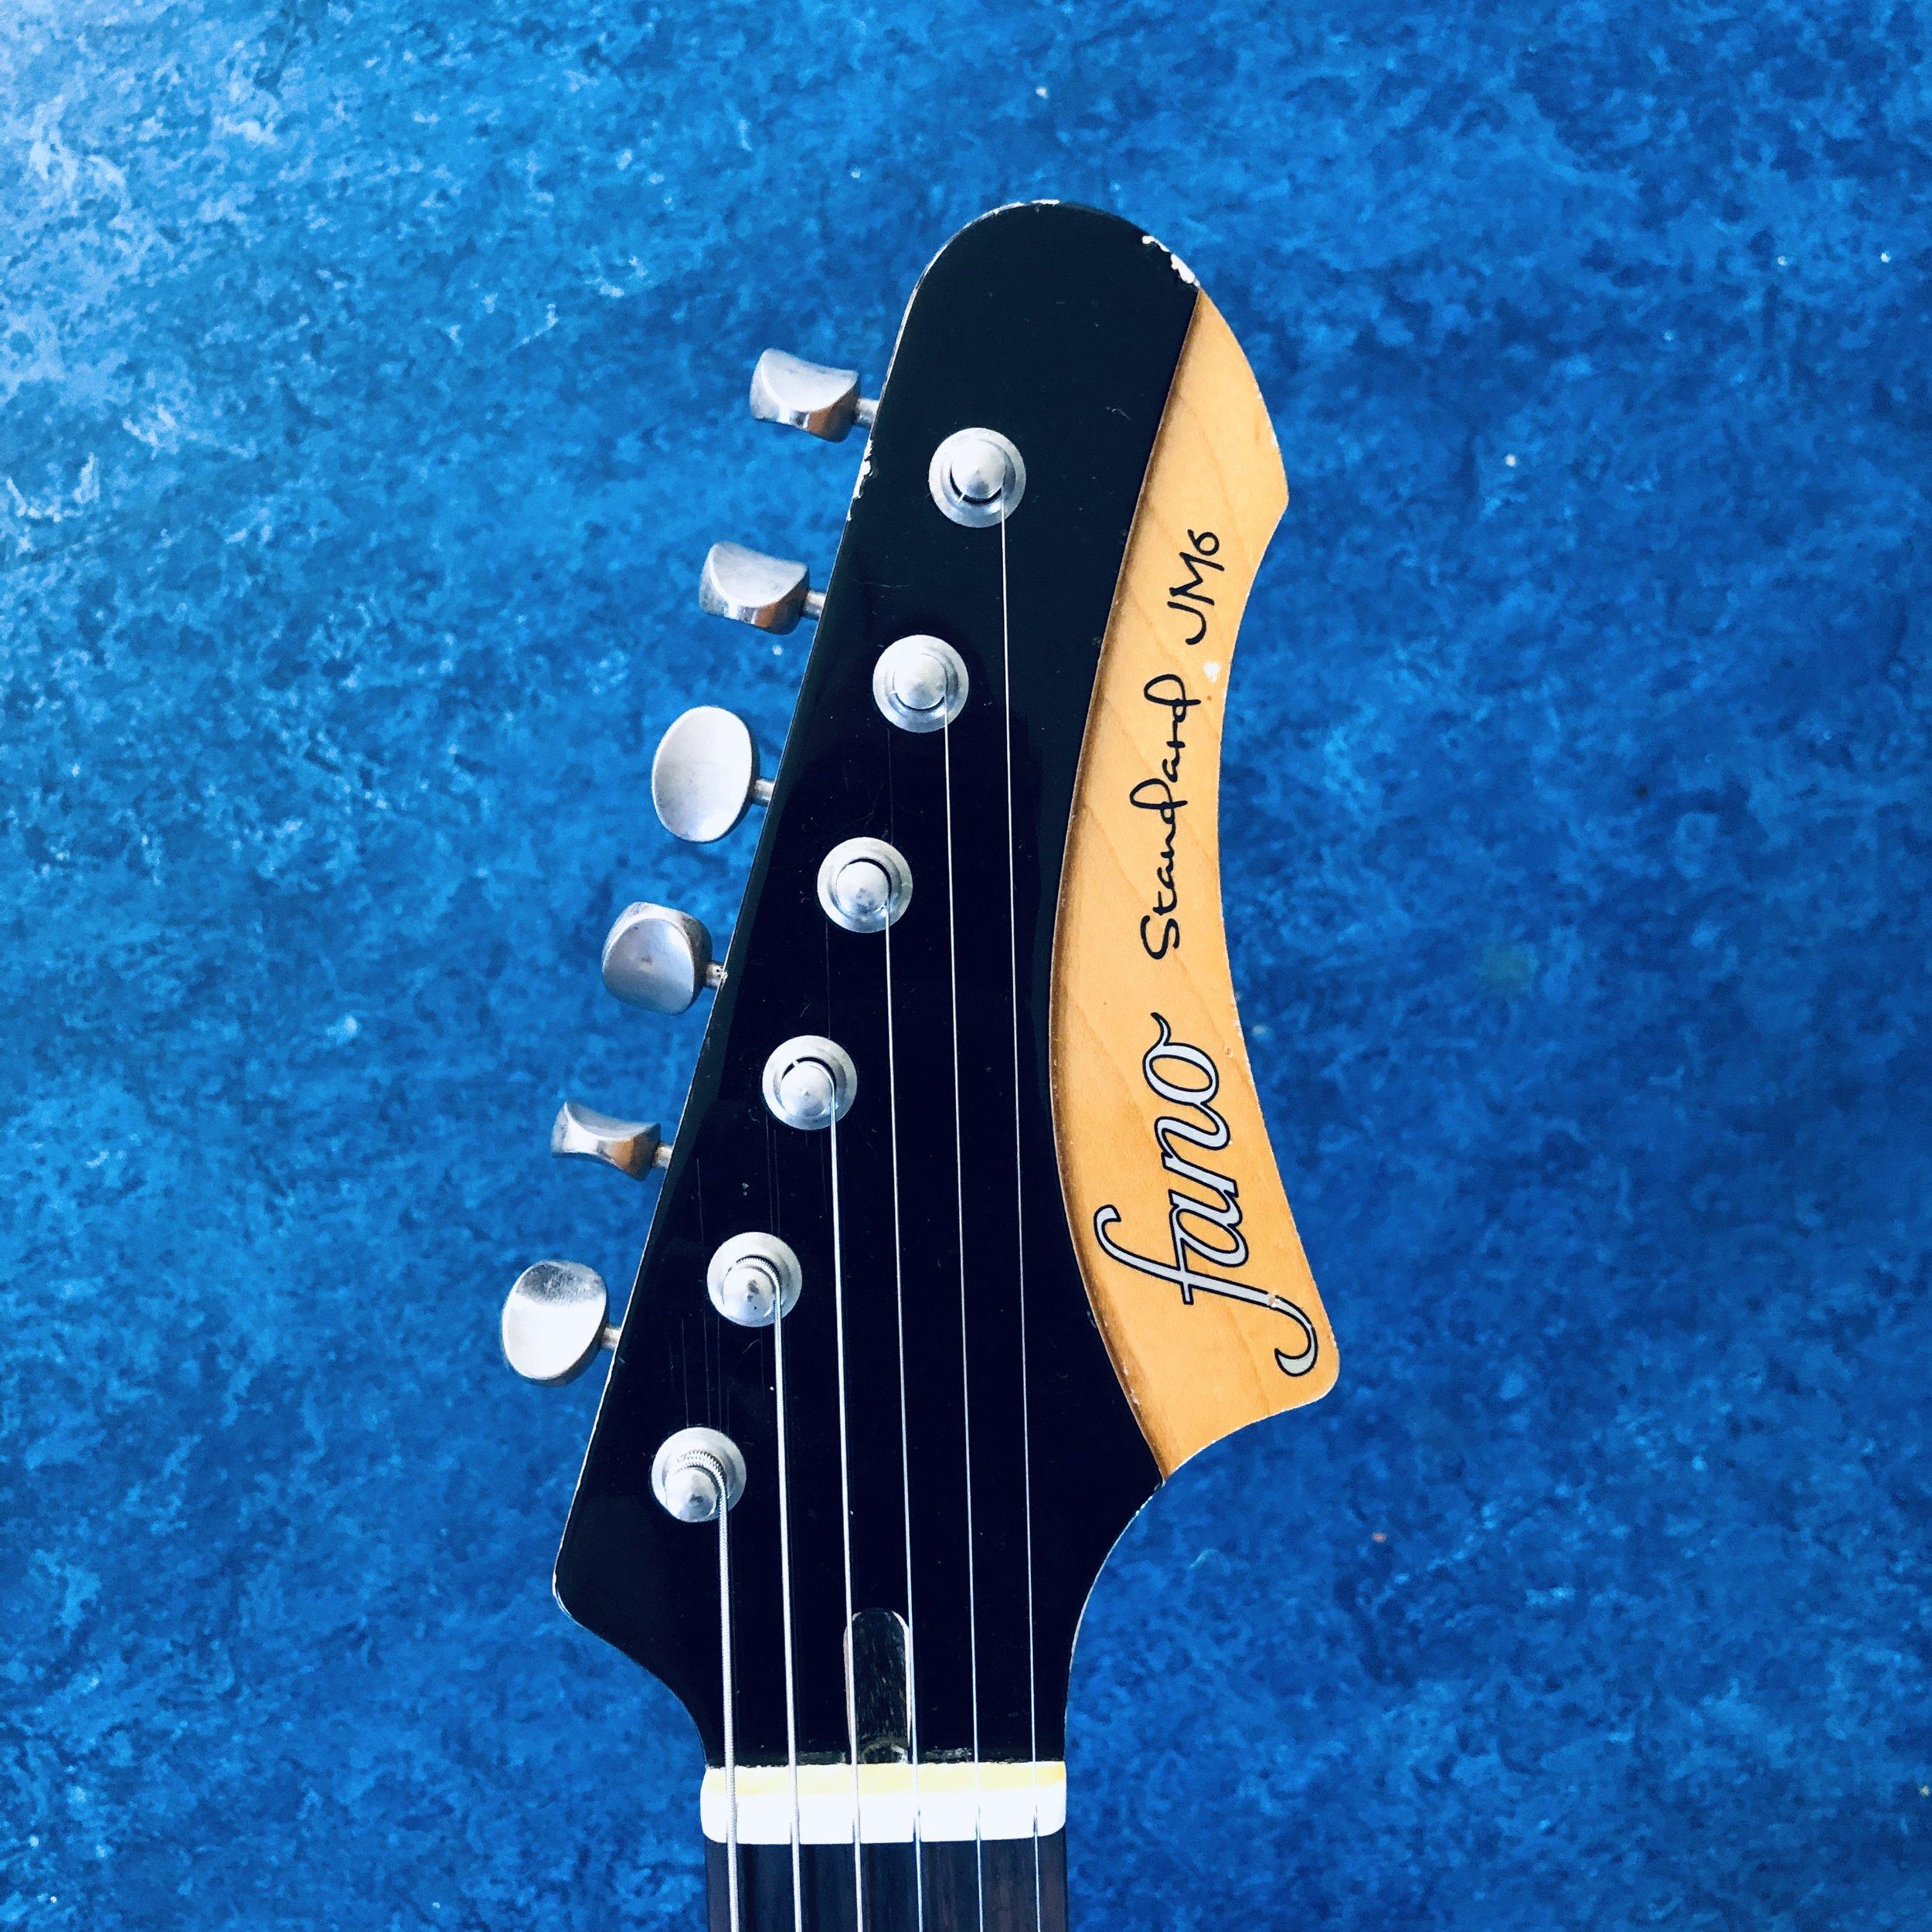 fano-guitar-headstock.jpg